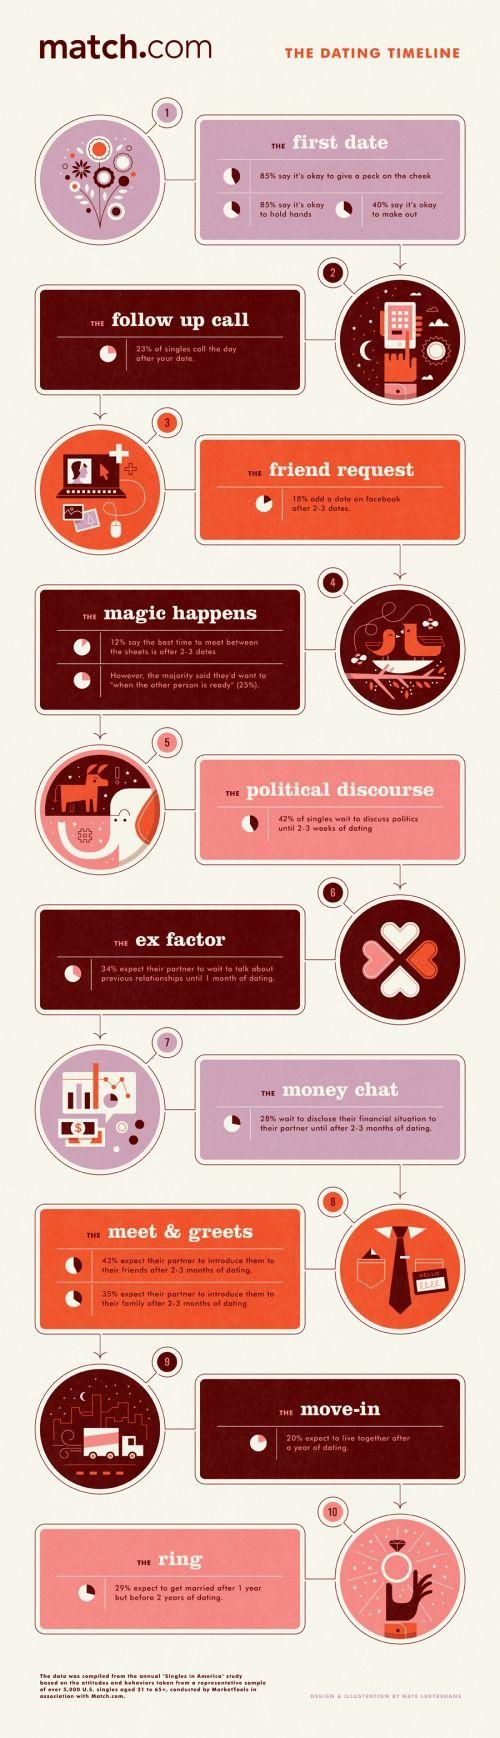 Nate Luetkehans awesome infographic